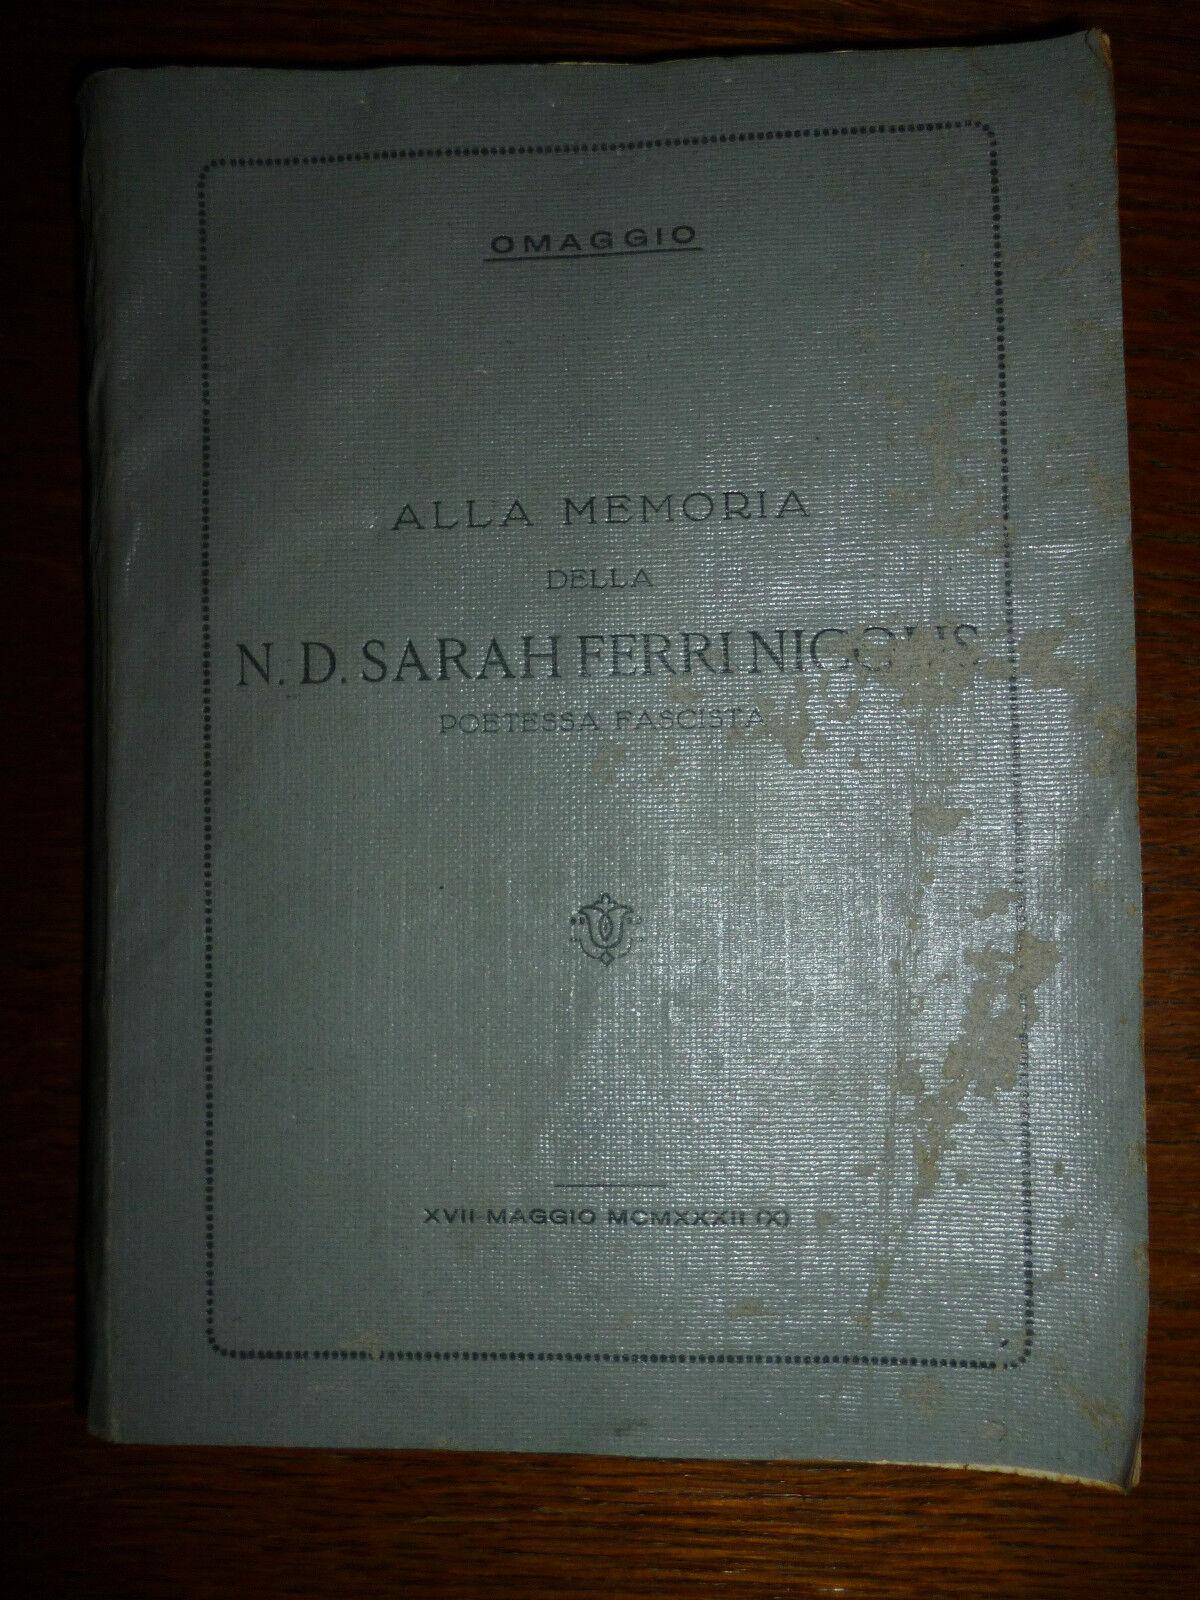 Alla memoria della N. D. Sarah Ferri Nicolis poetessa fascista